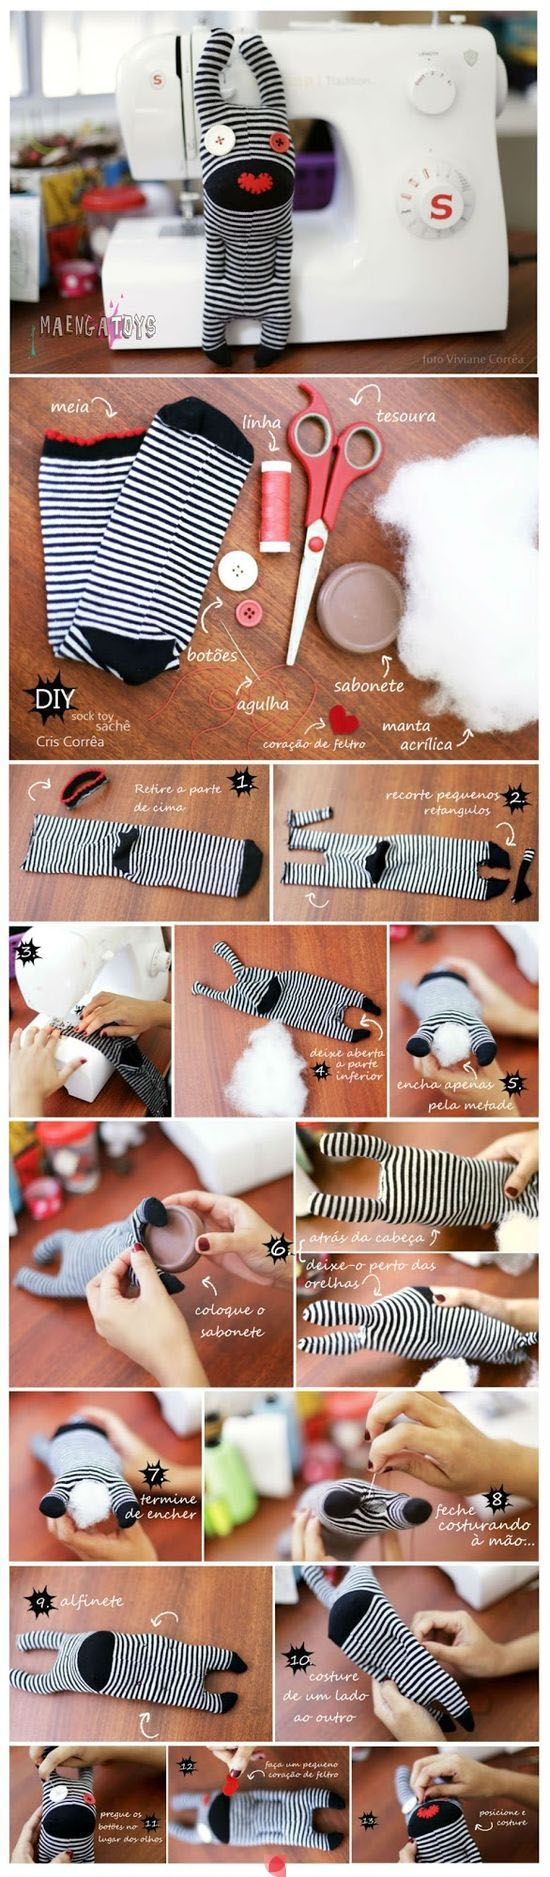 come riciclare le calze